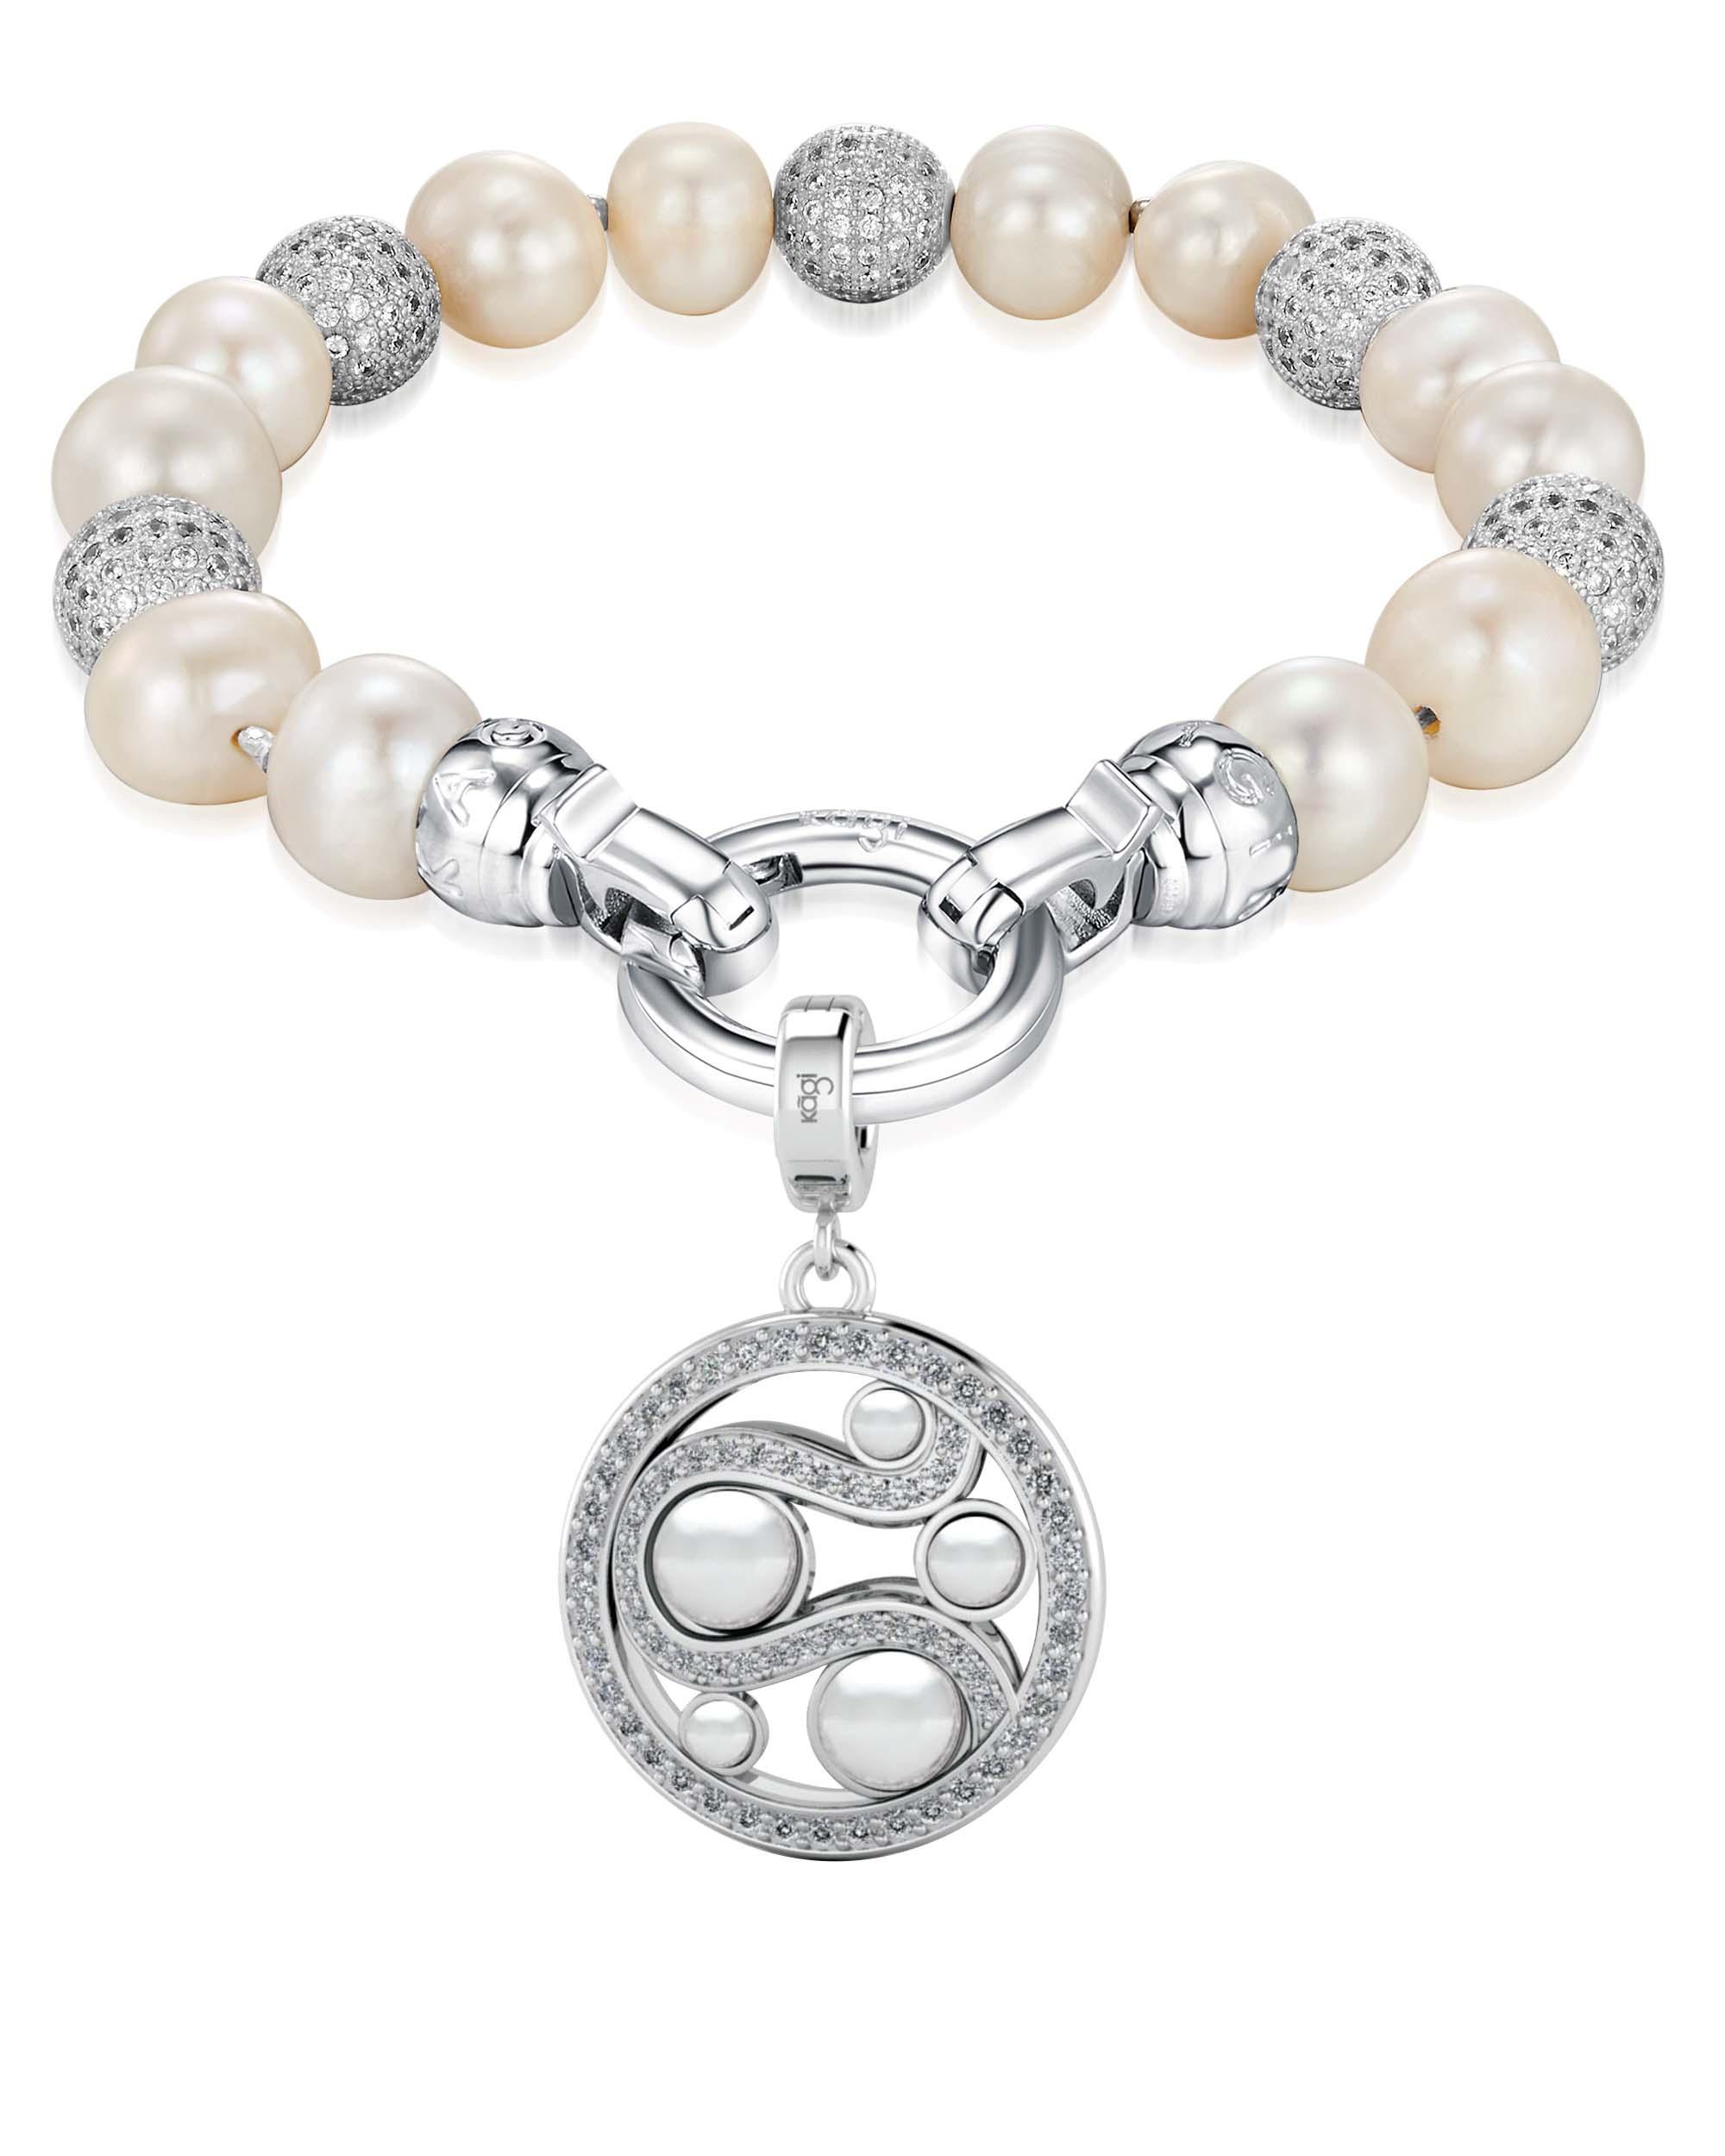 Kagi Pearl Luxe Bracelet $169 with Mystic Pearl Small Pendant $149 www.kagi.net